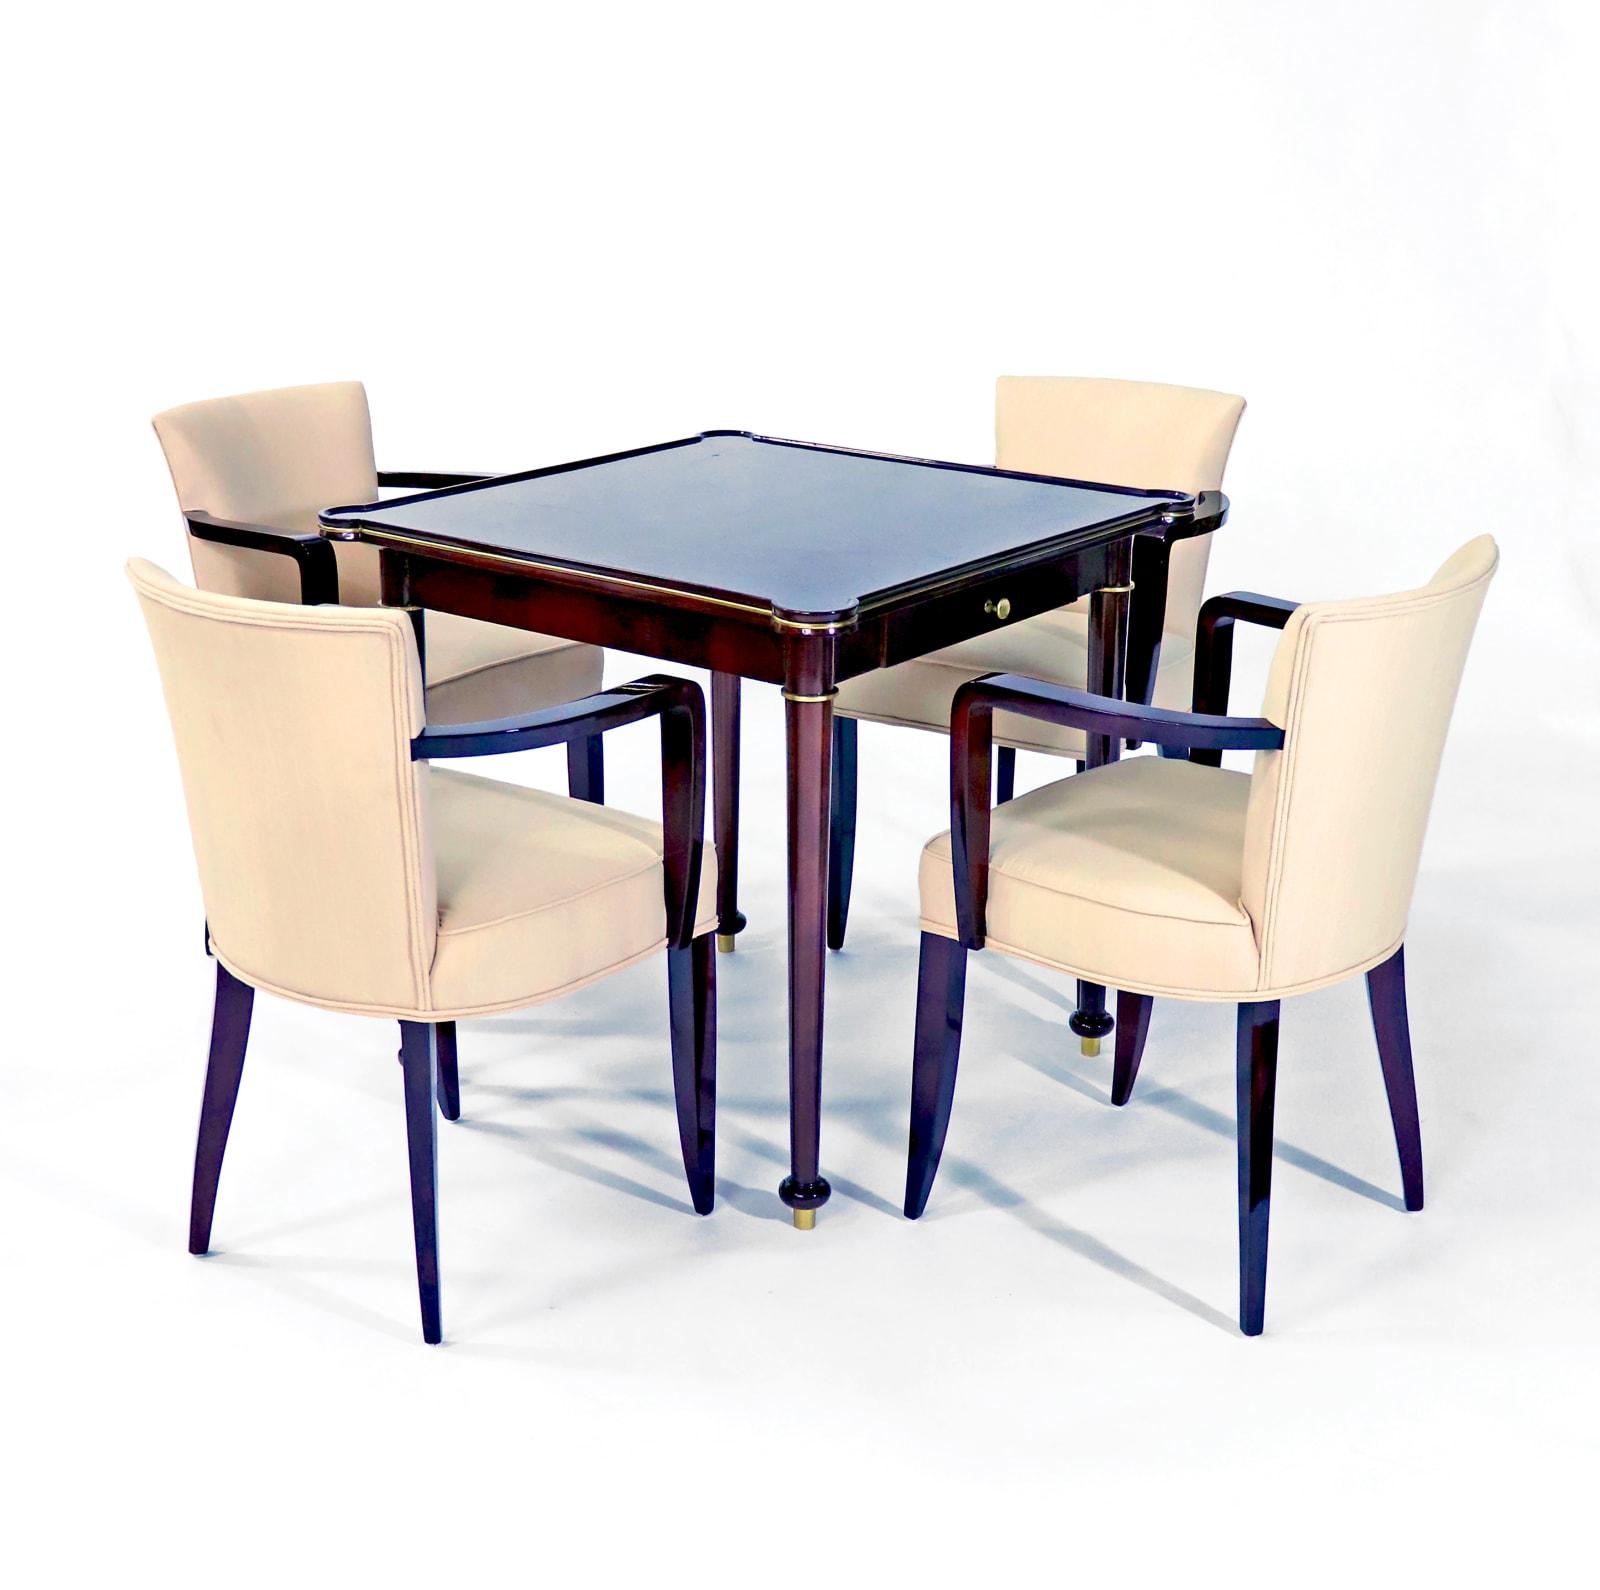 Game table Jules Lelelu France, 1945